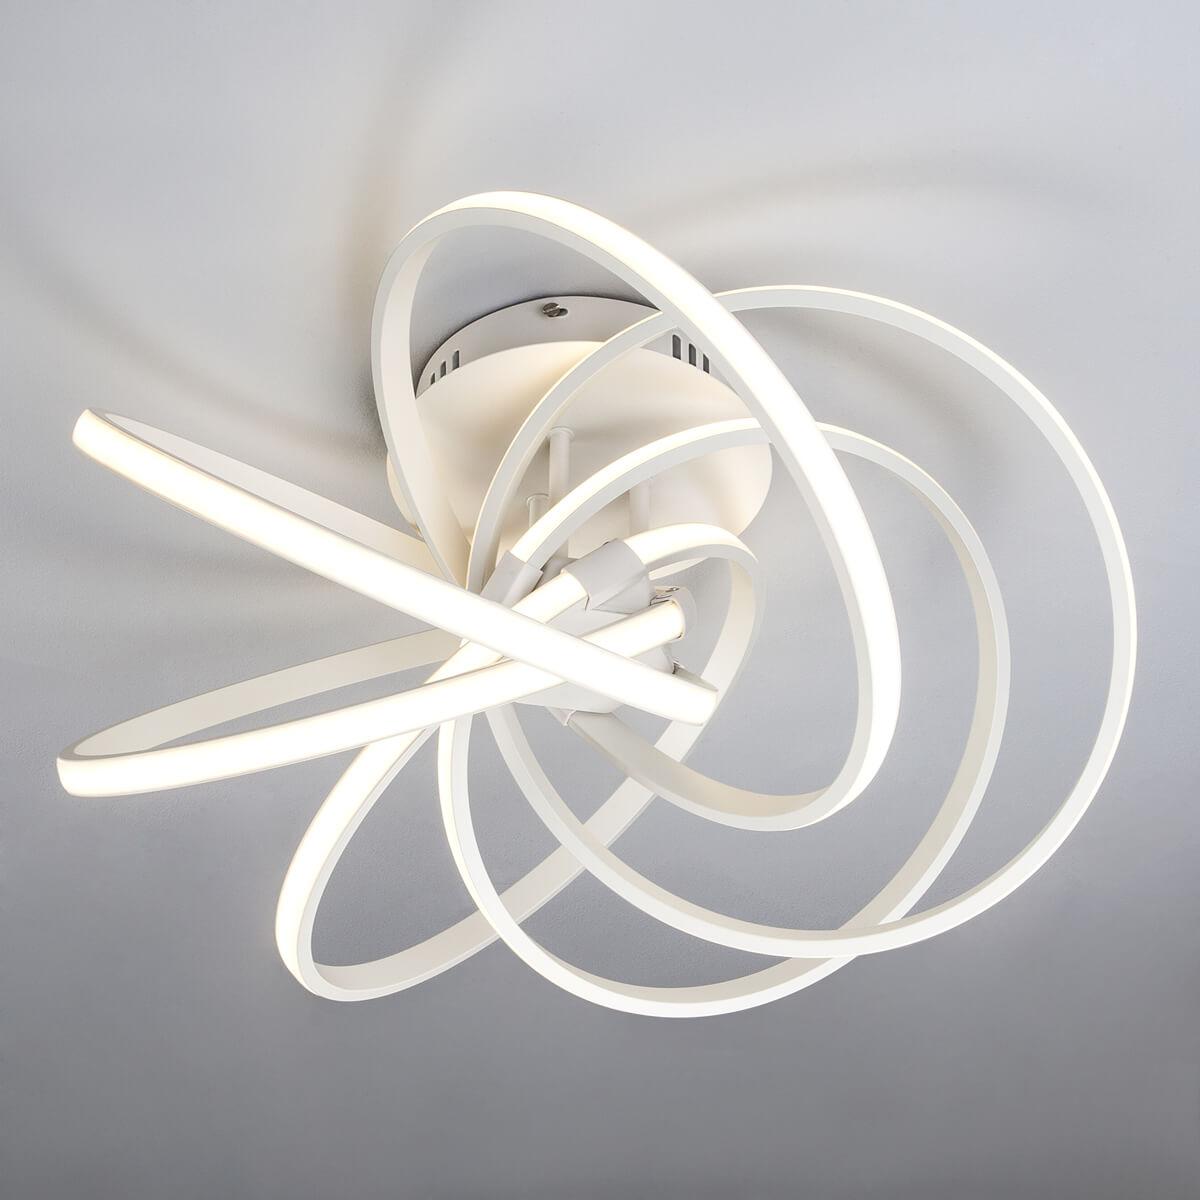 люстра светодиодная eurosvet energy 90044 3 22 м² цвет хром Светильник Eurosvet 90044/6 белый Energy